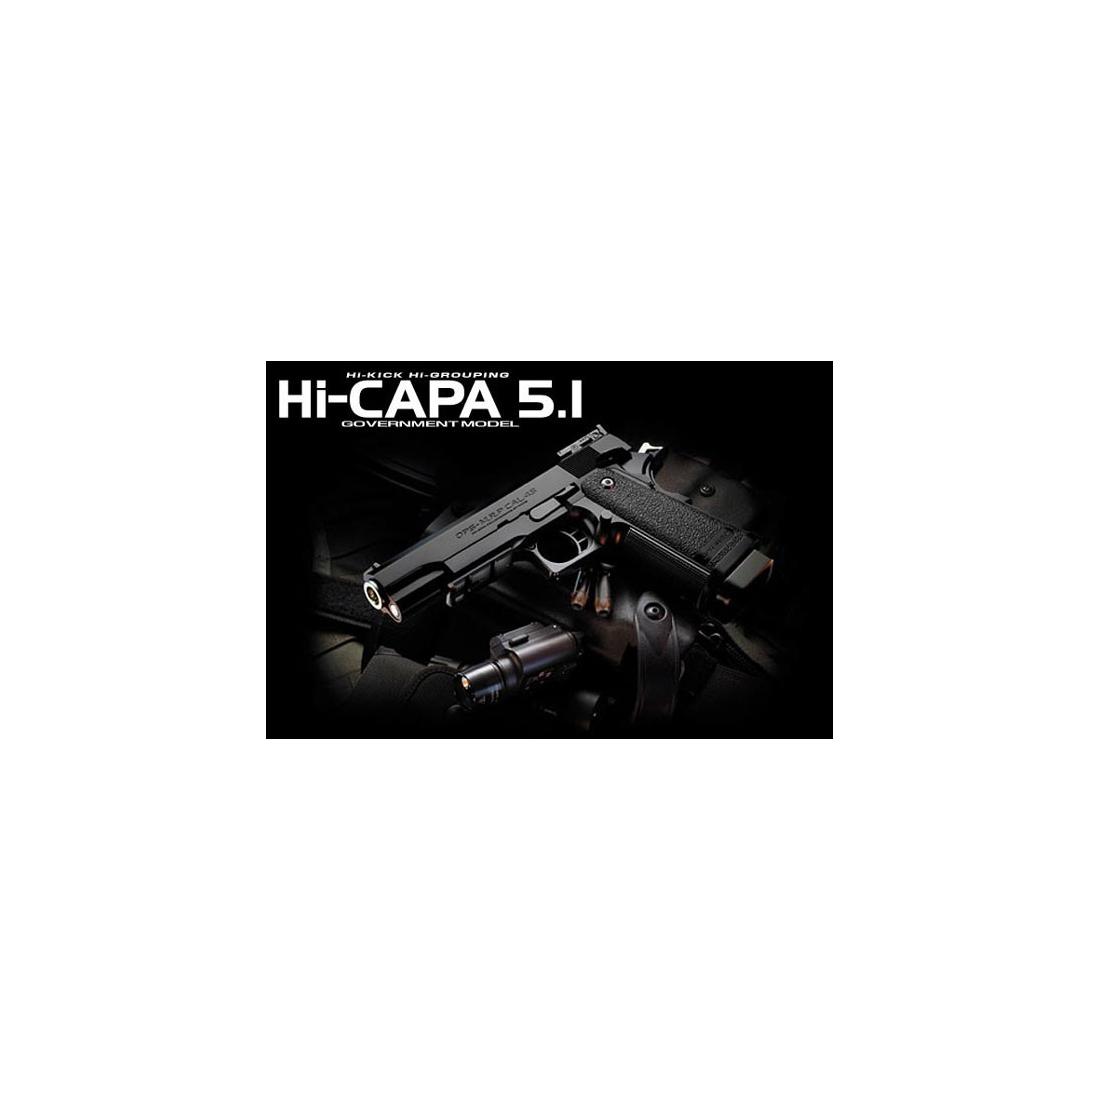 Pistola Hi-Capa 5.1 Government Gas Blowback [Tokyo Marui]